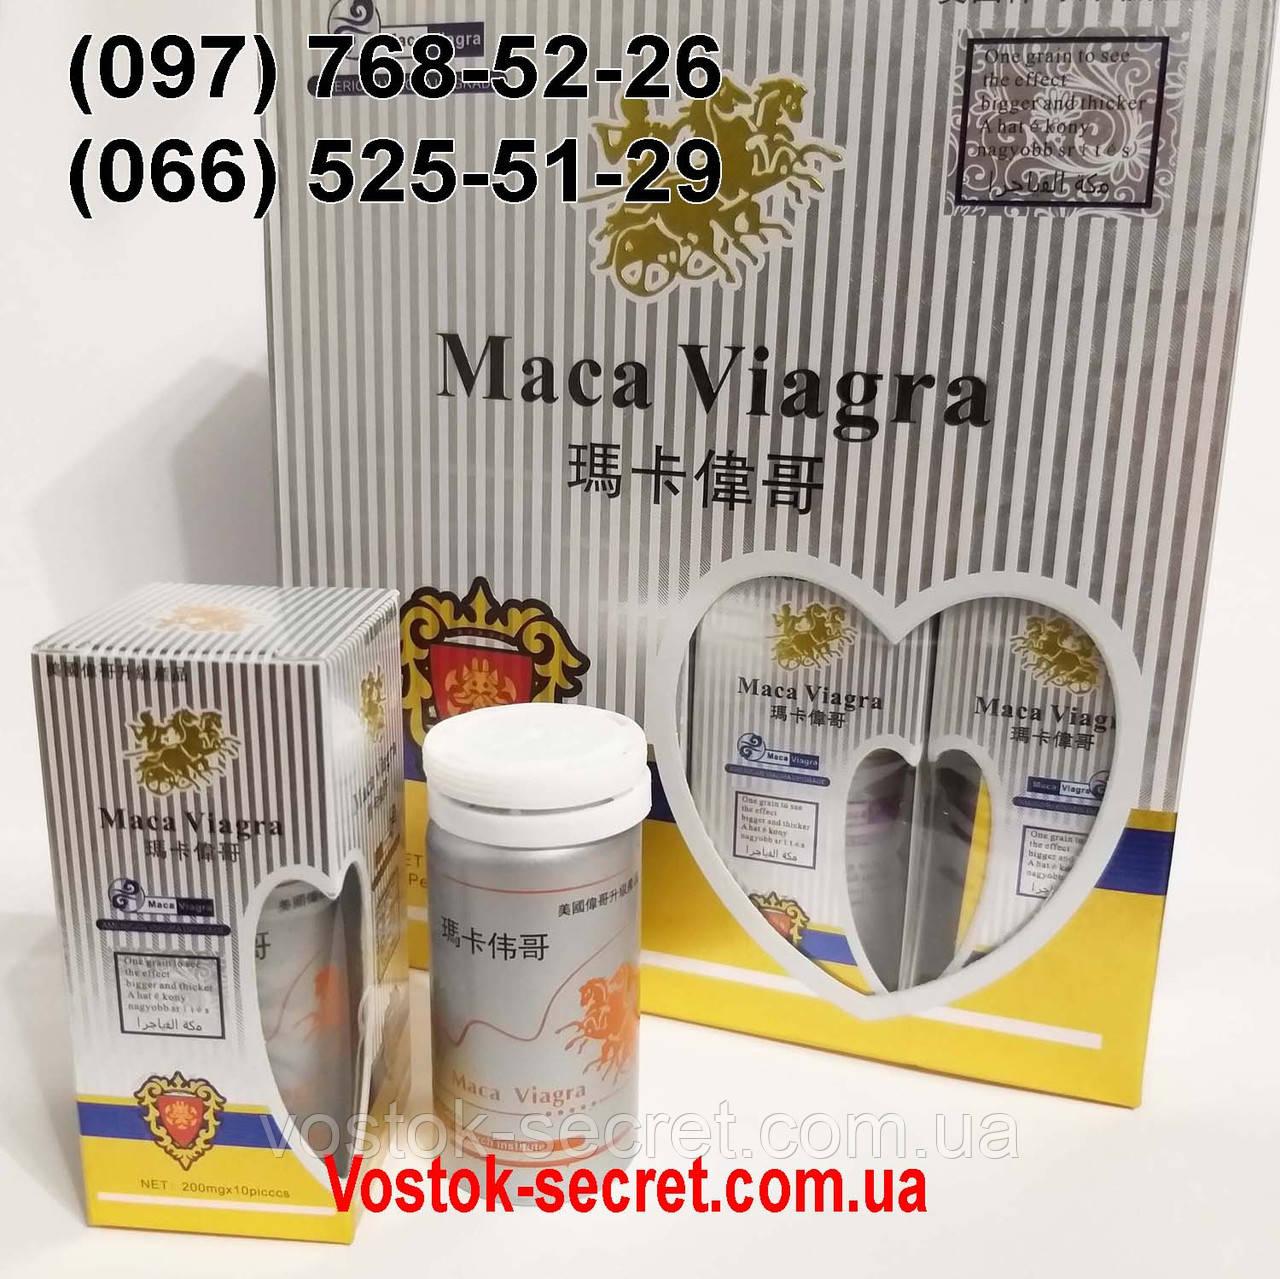 Maca Via.. (Мака) препарат для повышения мужской потенции, 10табл